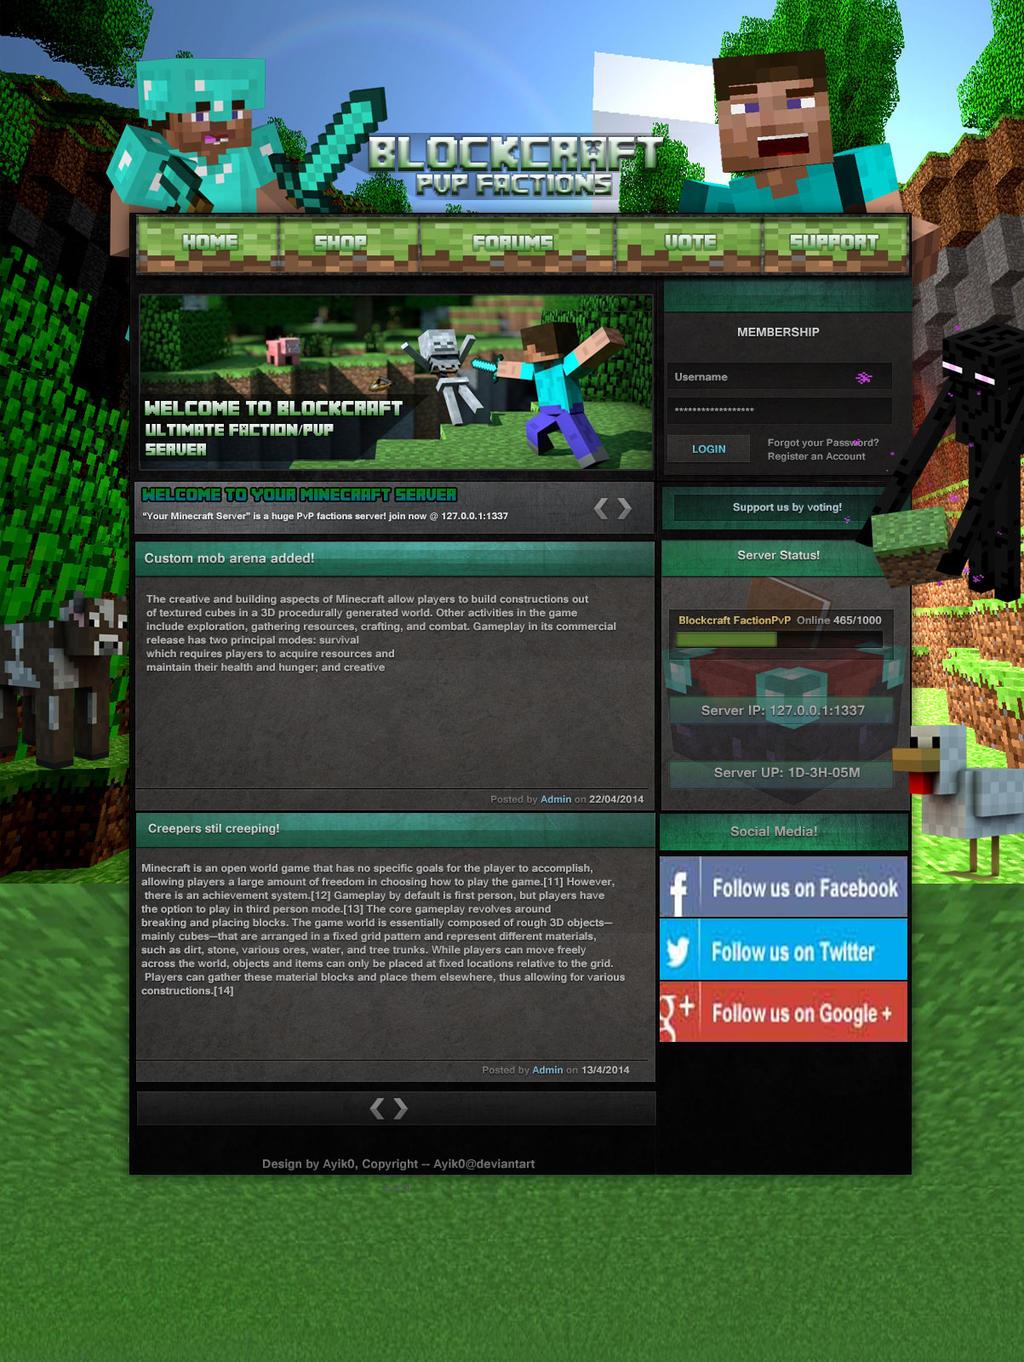 Minecraft Website Design Other Fan Art Fan Art Show Your - Game design forum